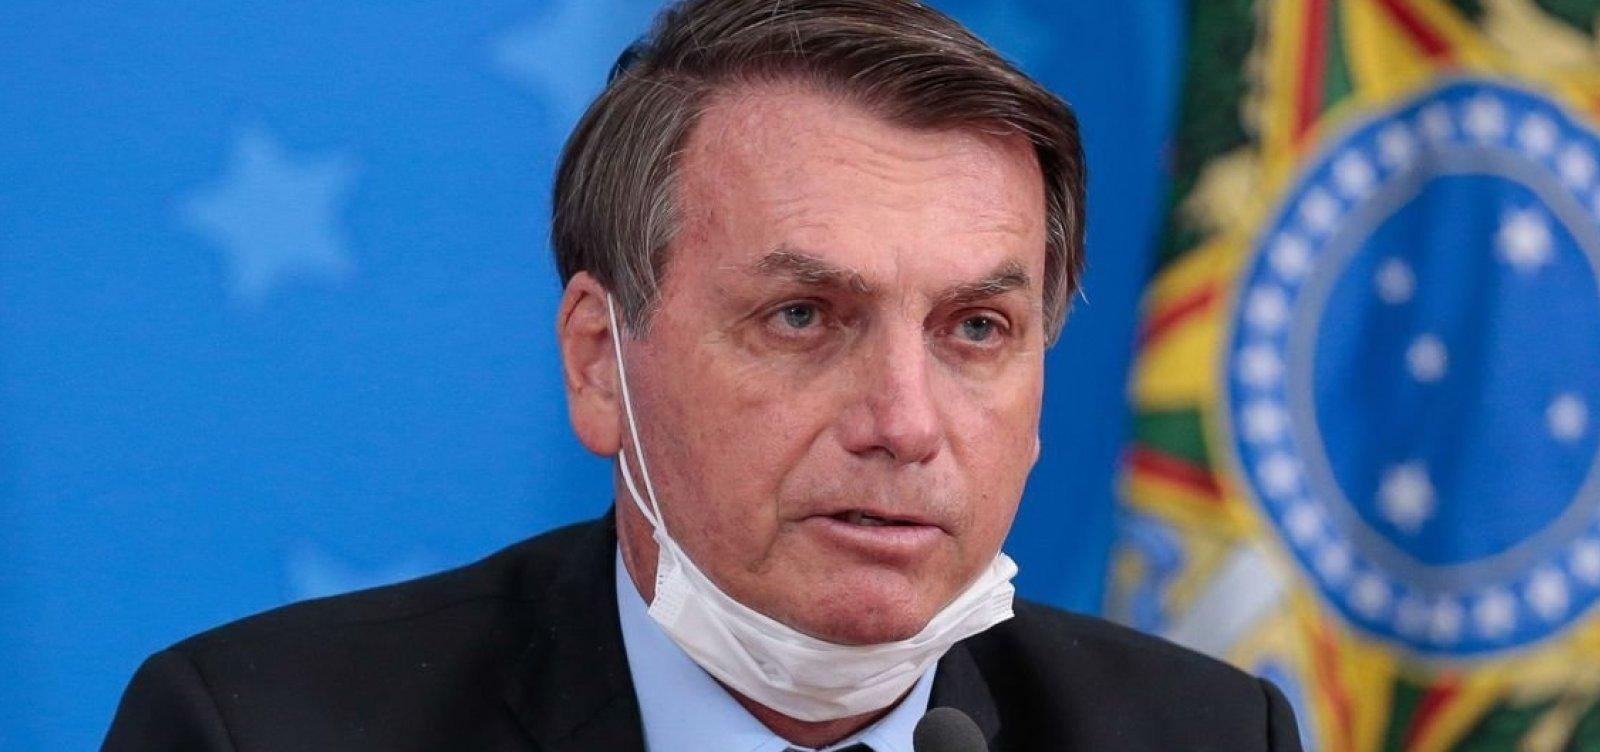 'Falta-lhe coragem moral', diz Bolsonaro sobre Barroso